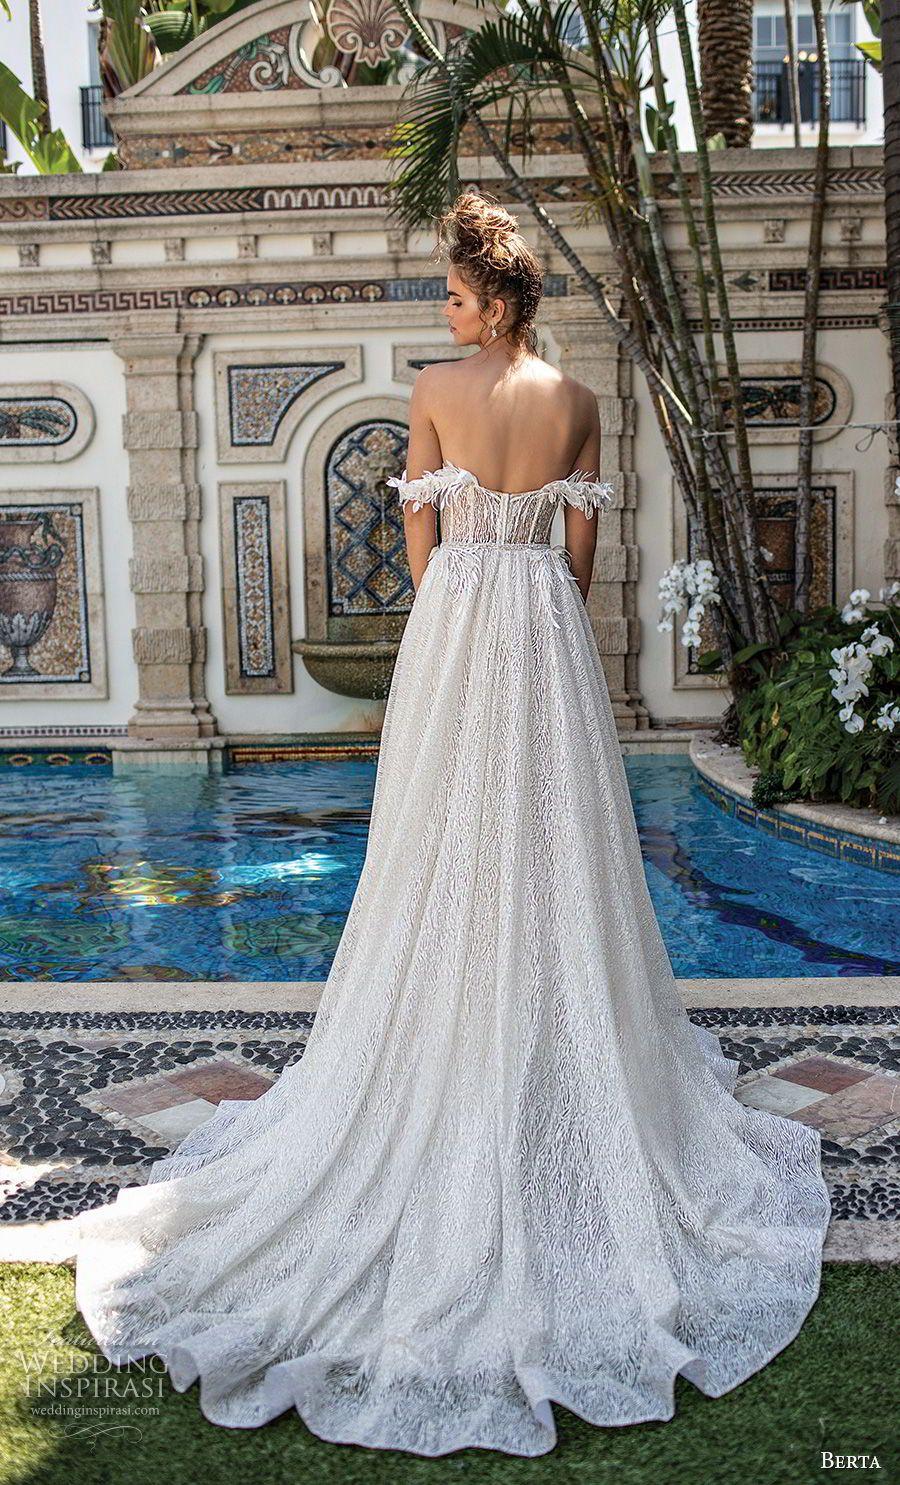 Lace dress vintage april 2019 Berta Spring  Wedding Dresses u ucMiamiud Bridal Collection